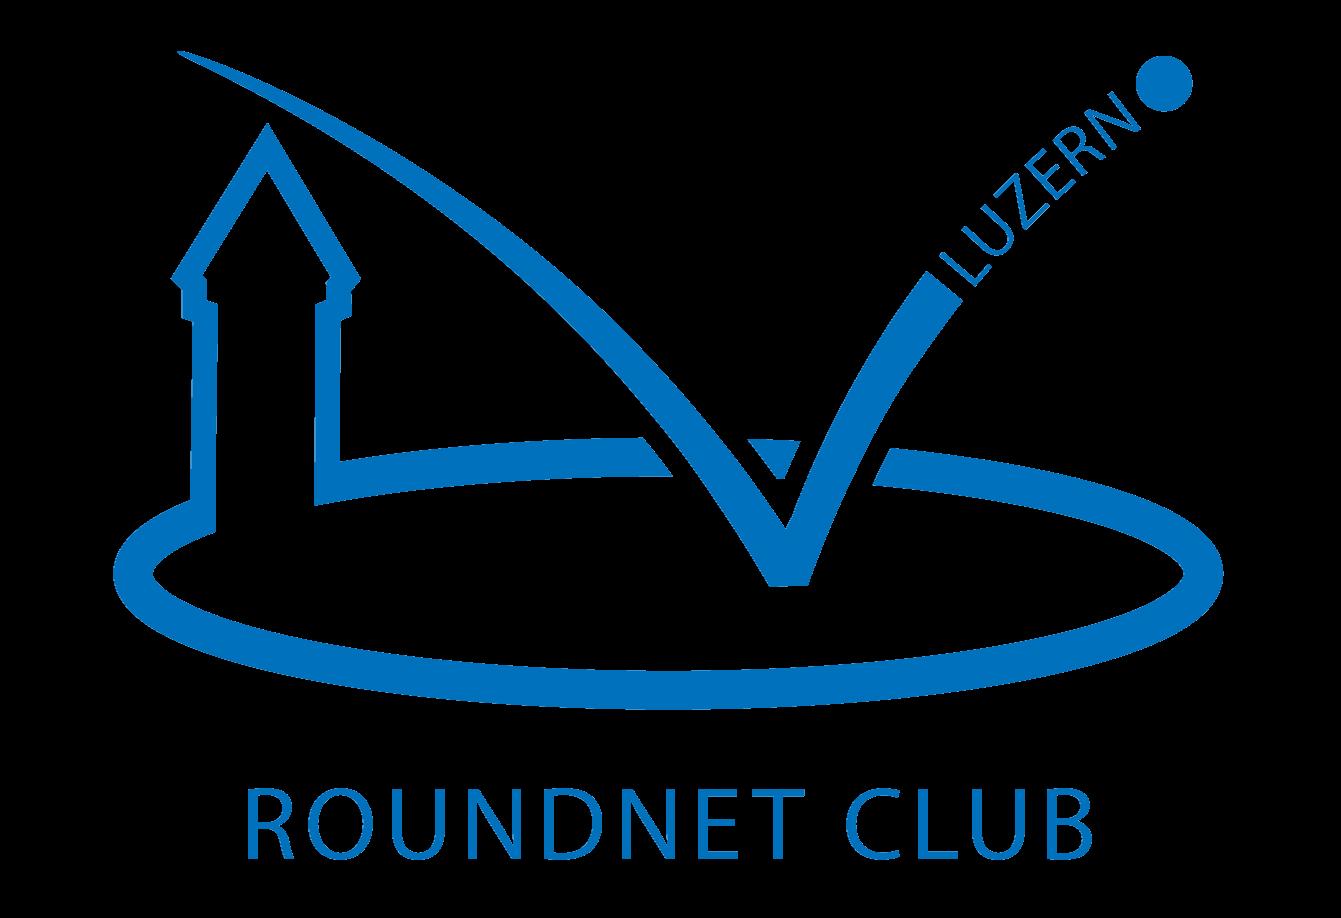 Roundnet Club Luzern